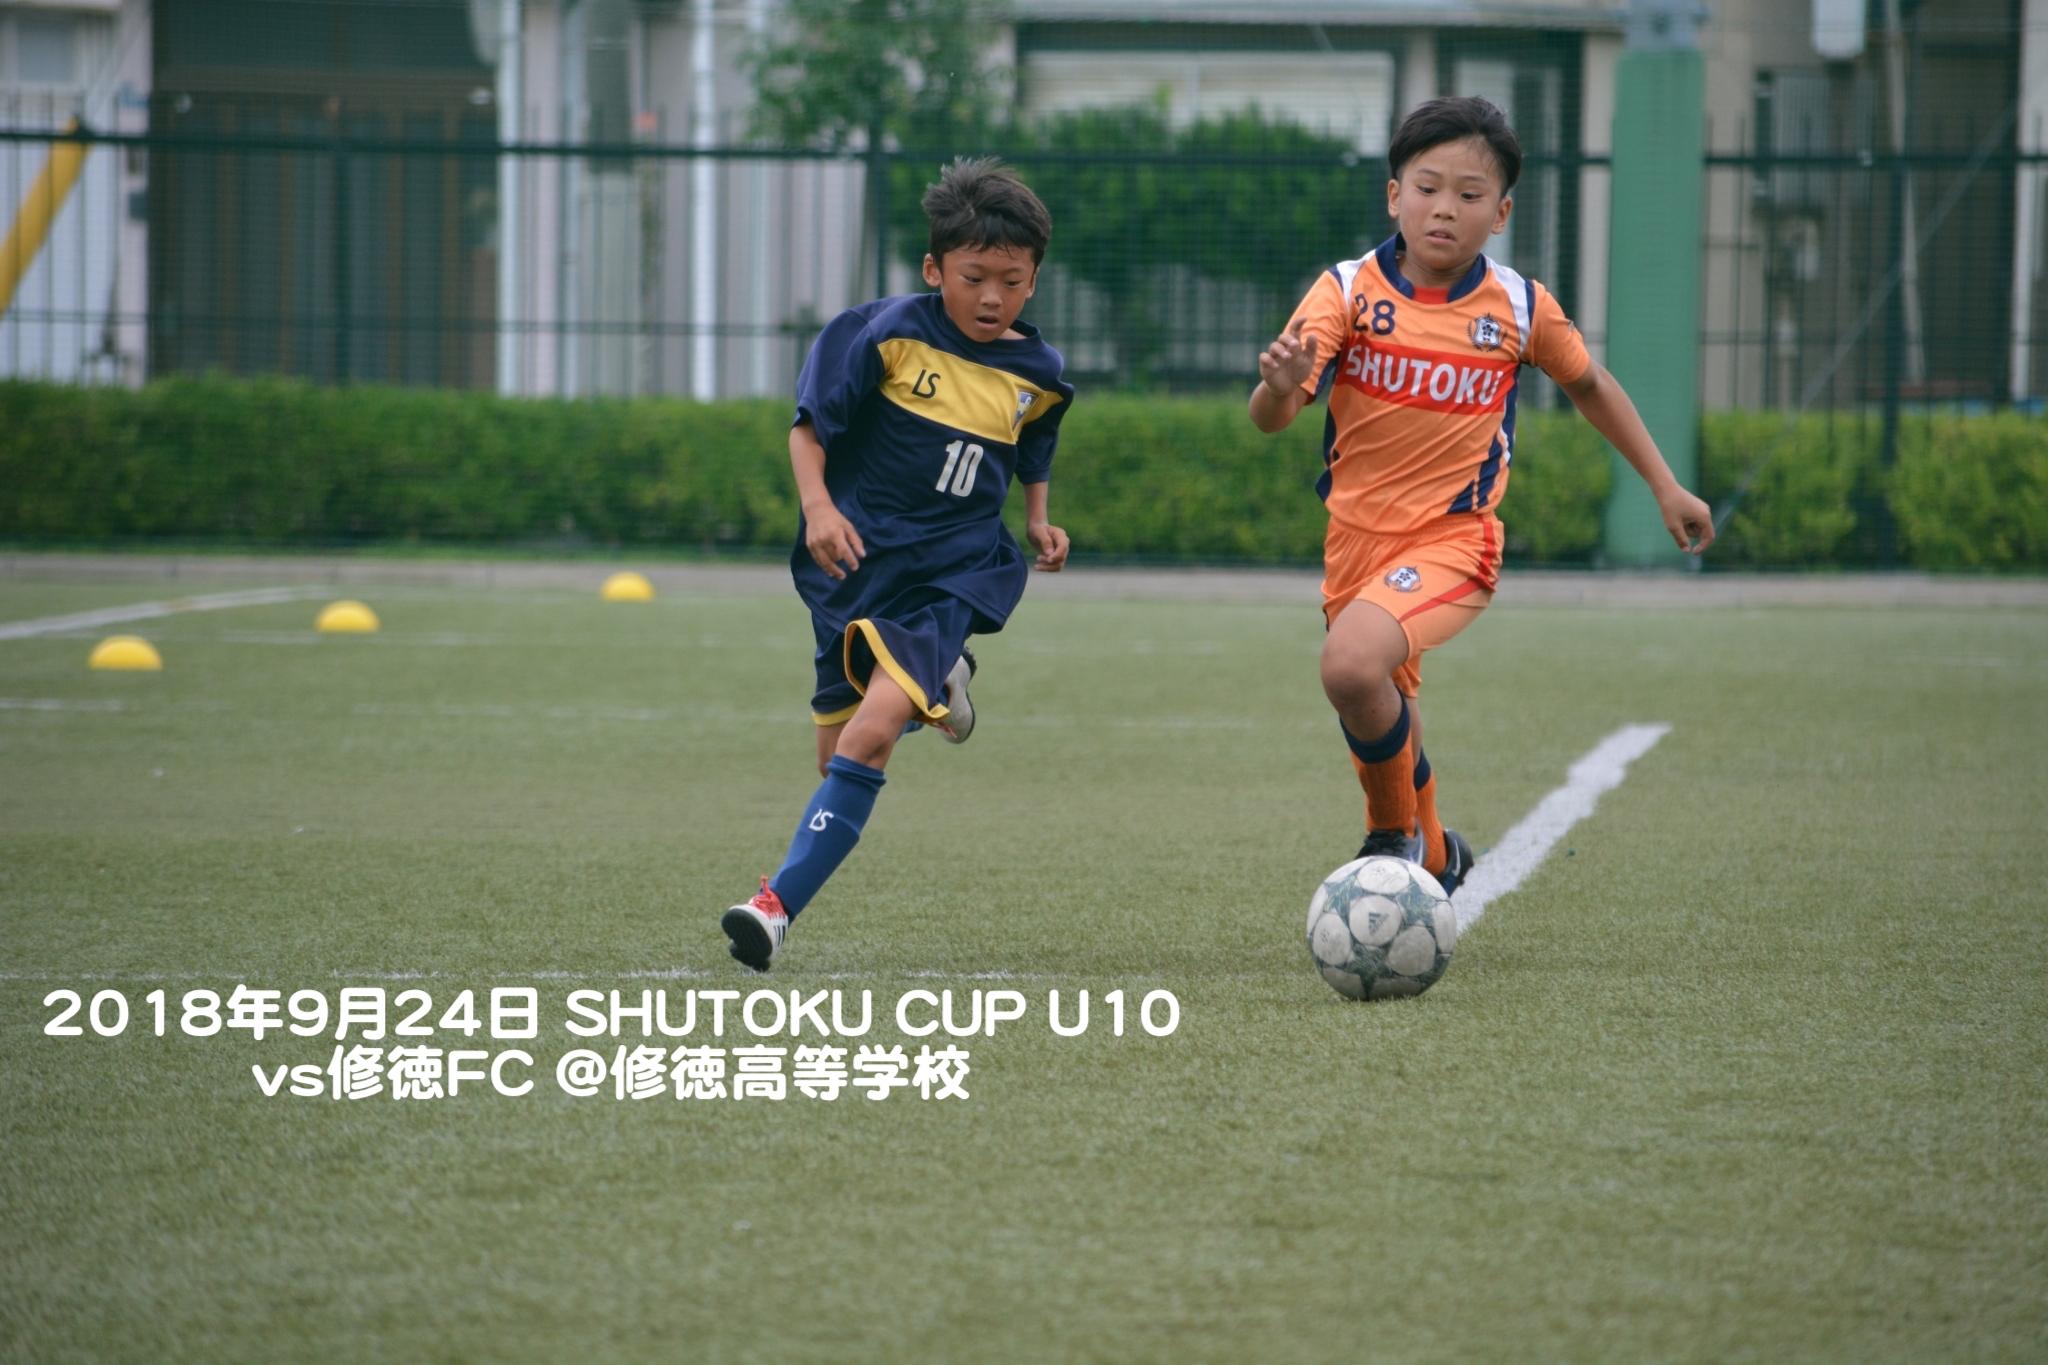 180924 SHUTOKU CUP_180928_0071